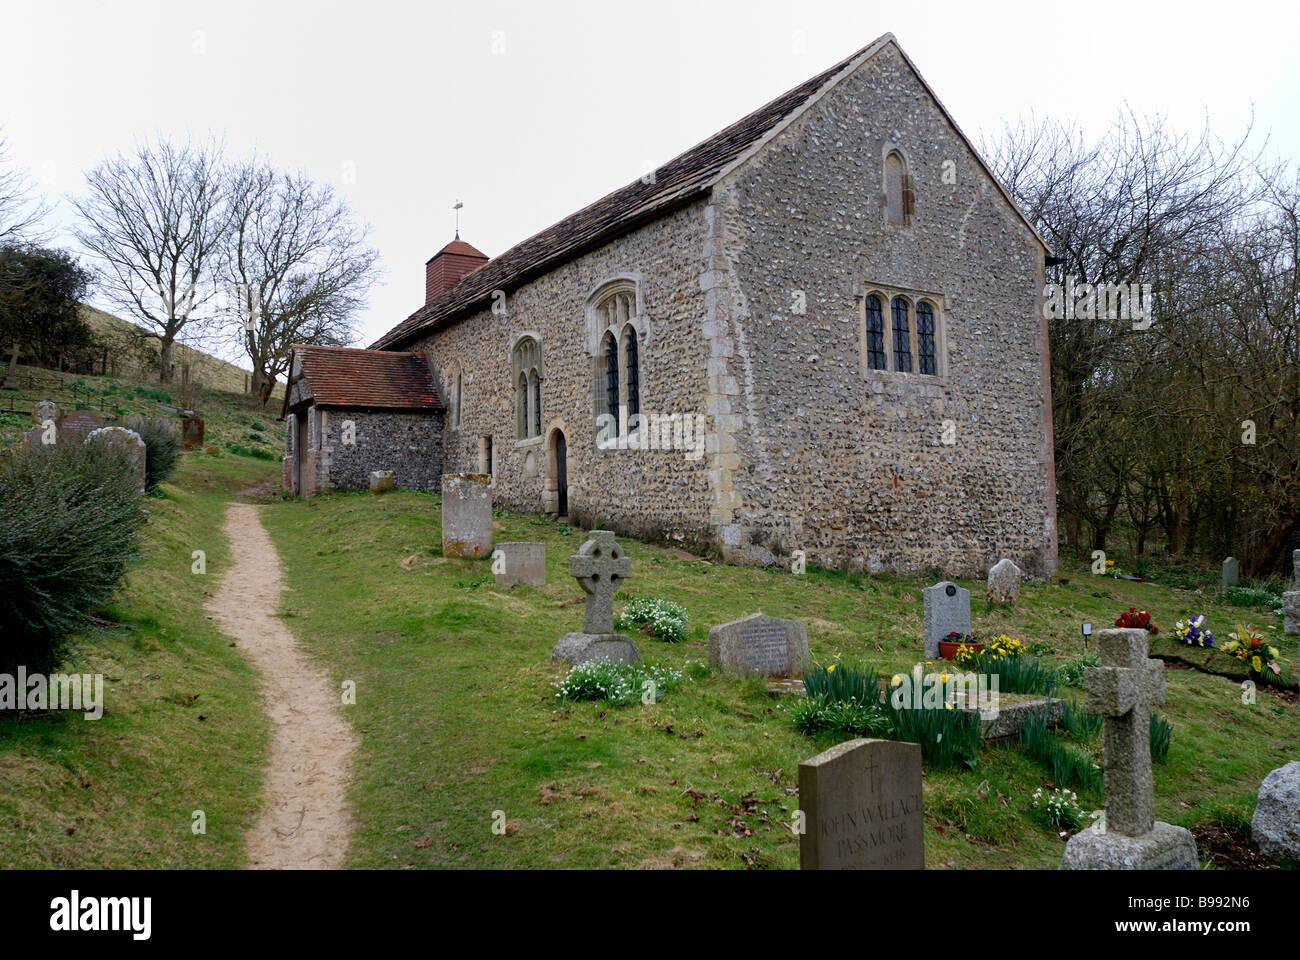 Coombes Church a Saxon church built 11th Century - Stock Image